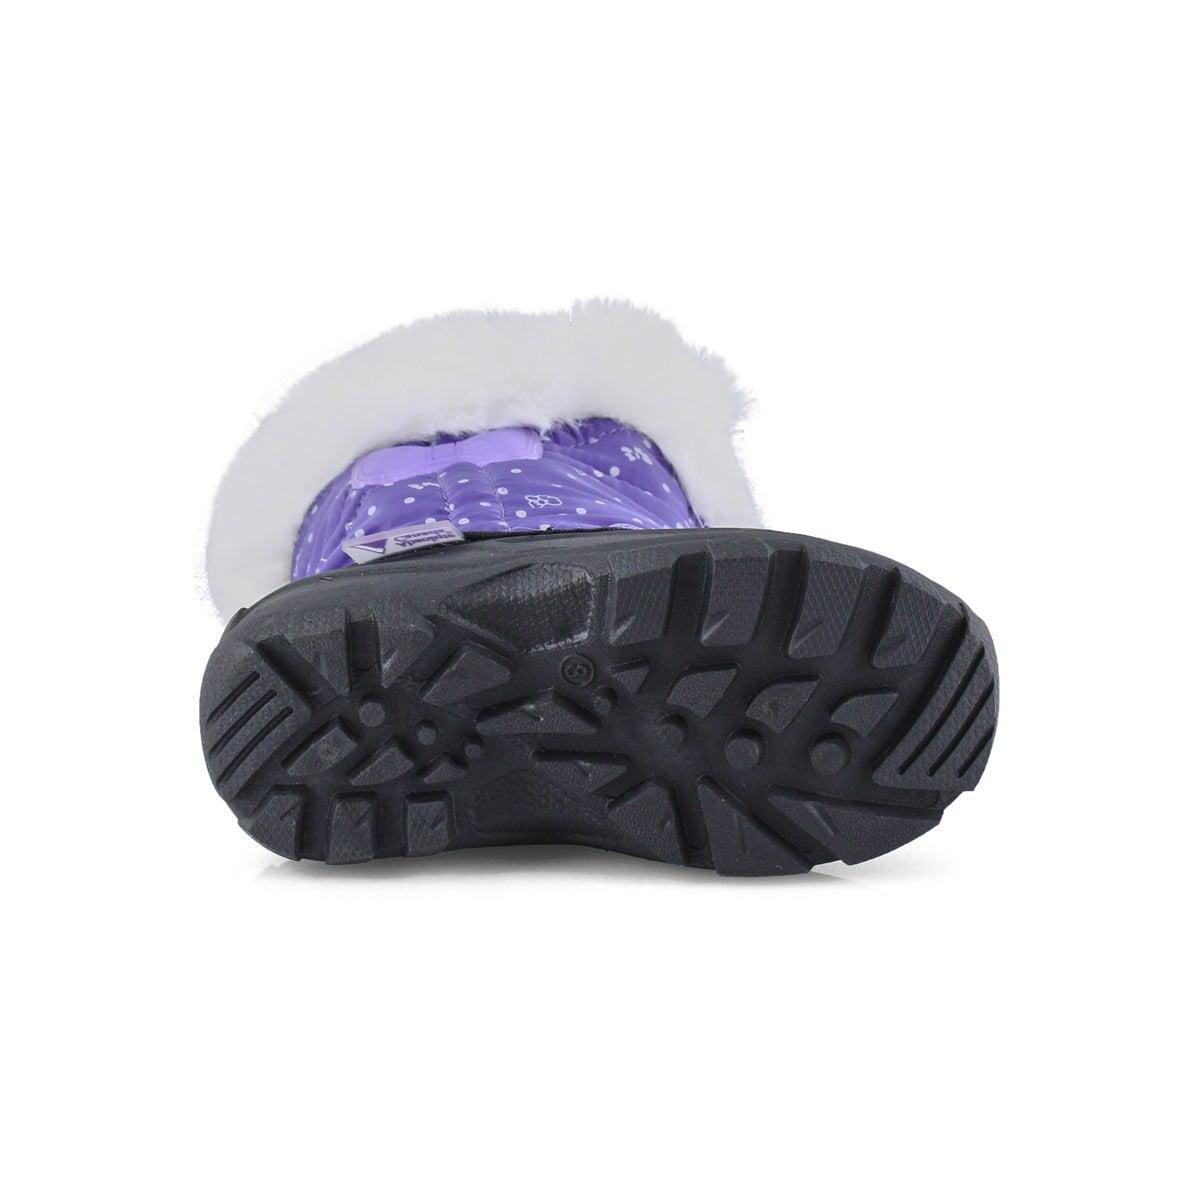 Infants' Eden 2 Winter Boot - Lavender